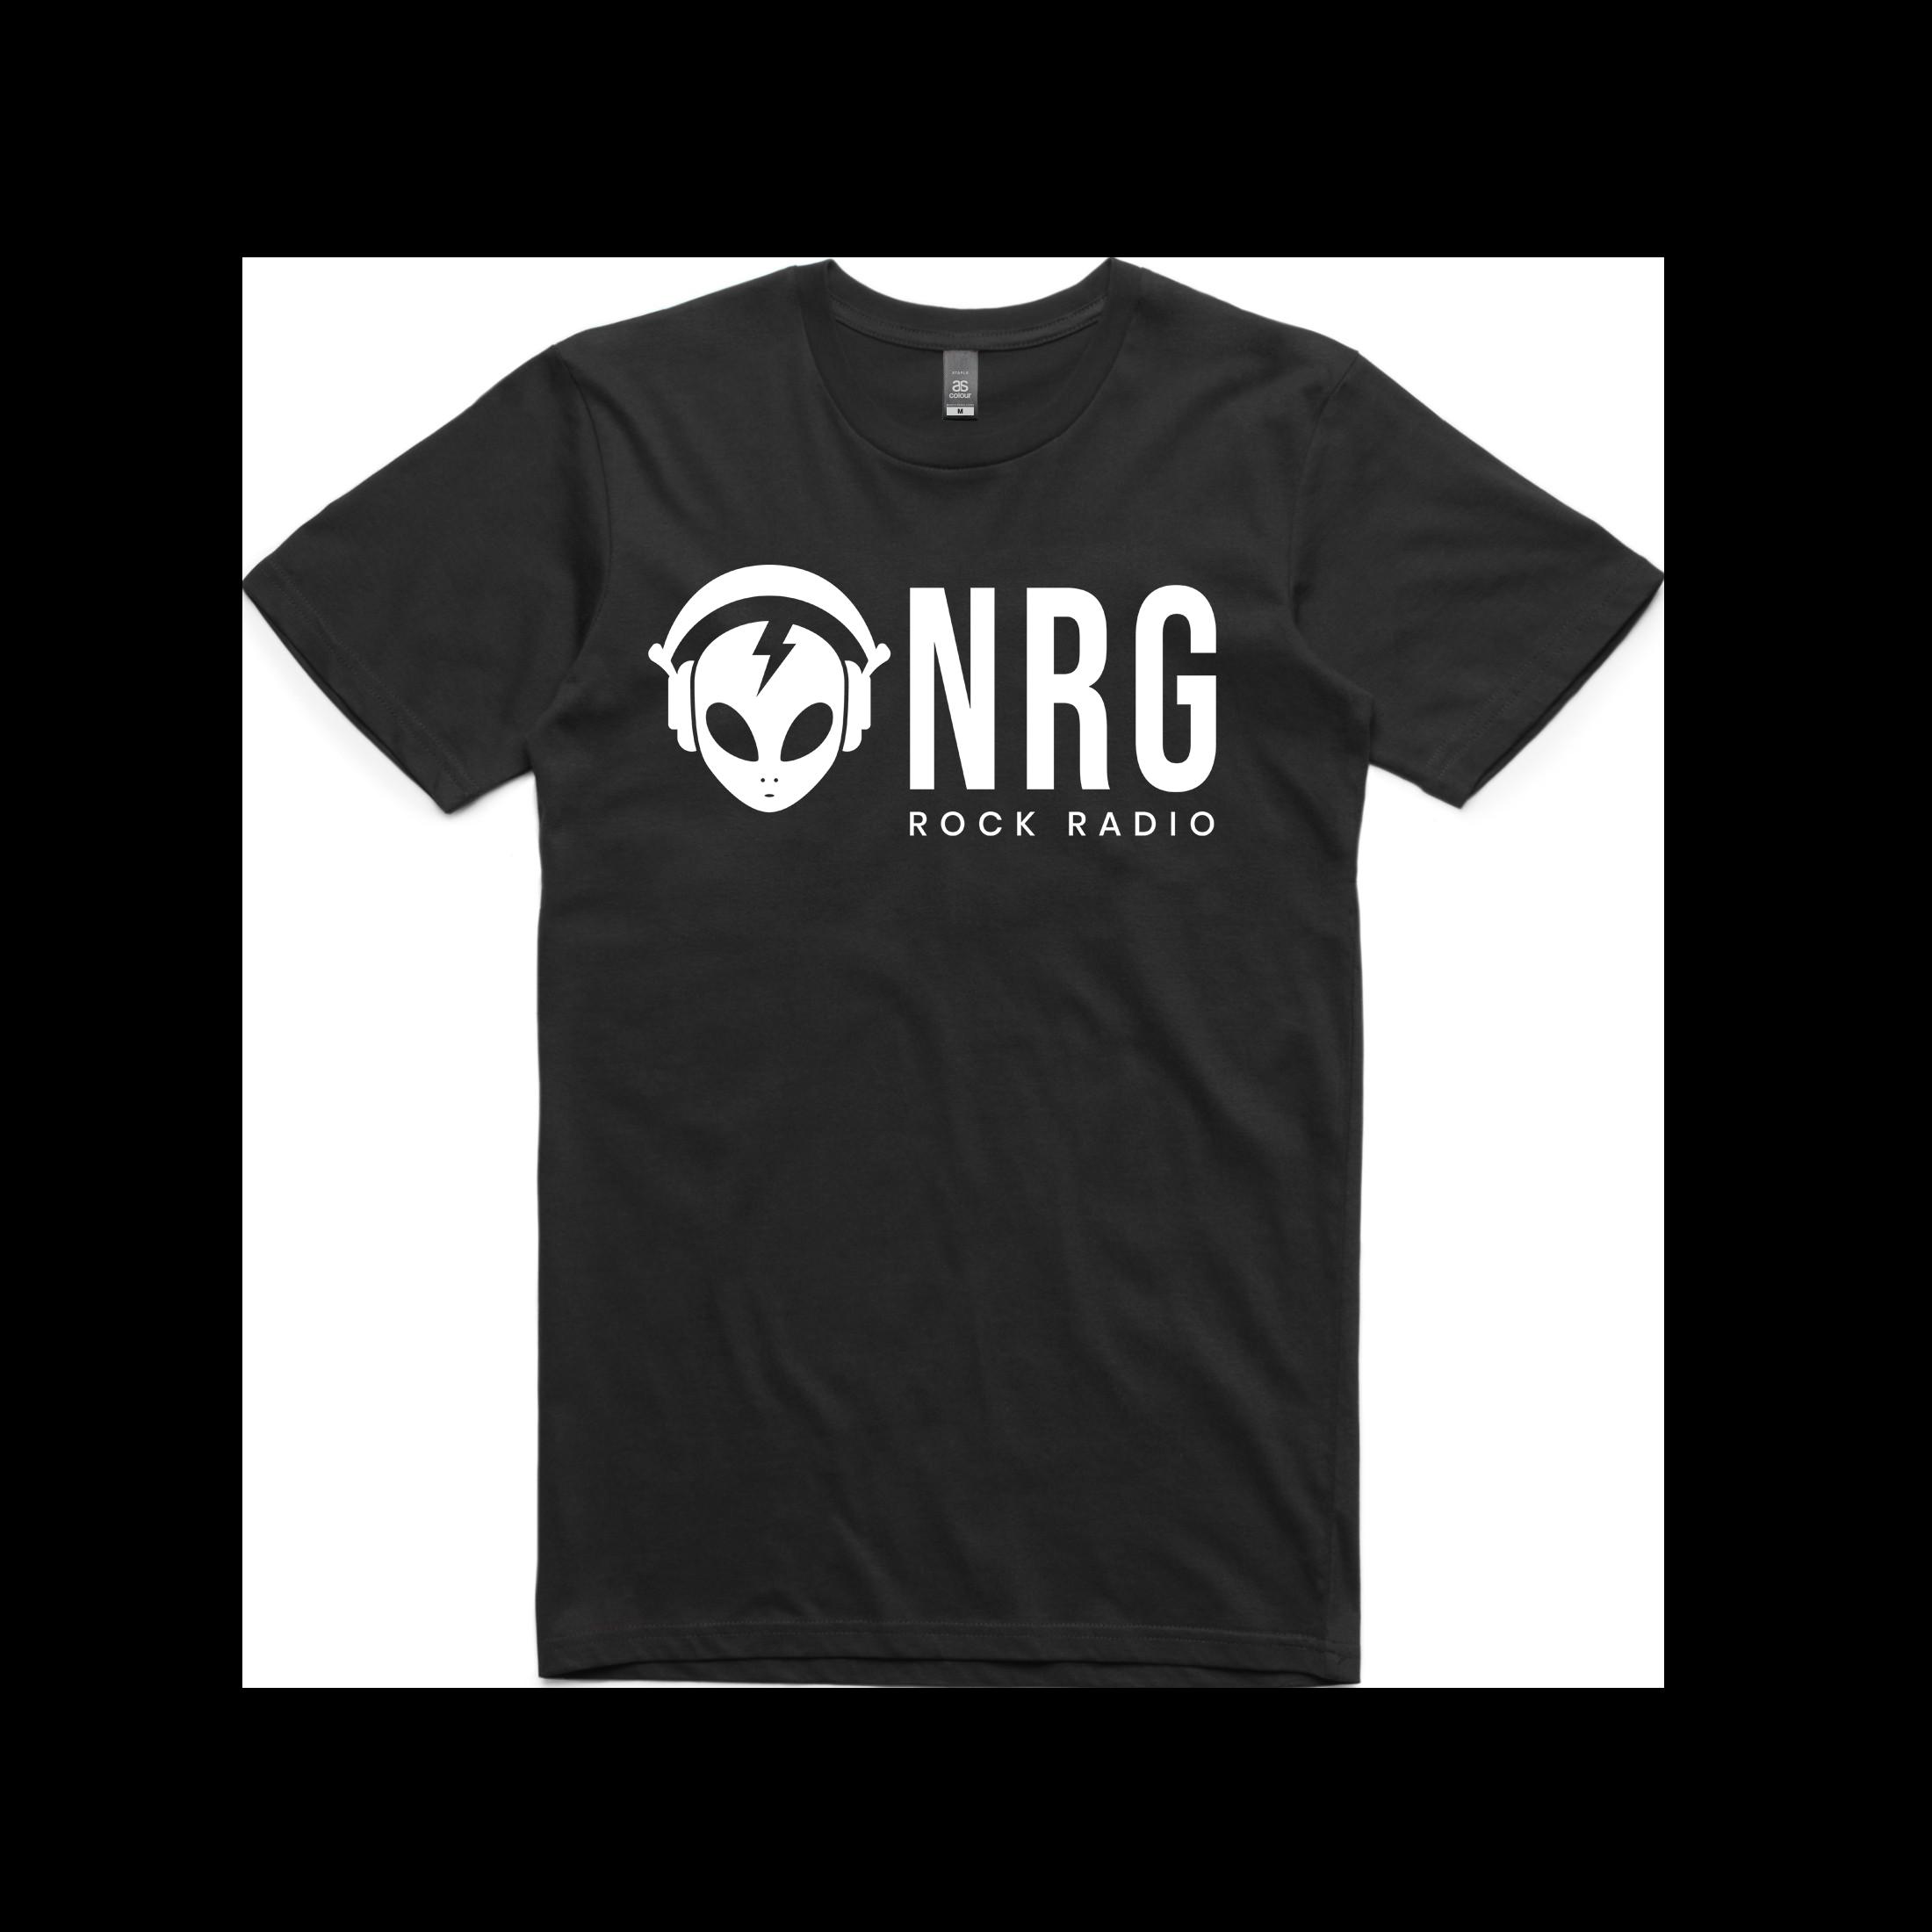 NRG Rock Radio Full - Logo Tee